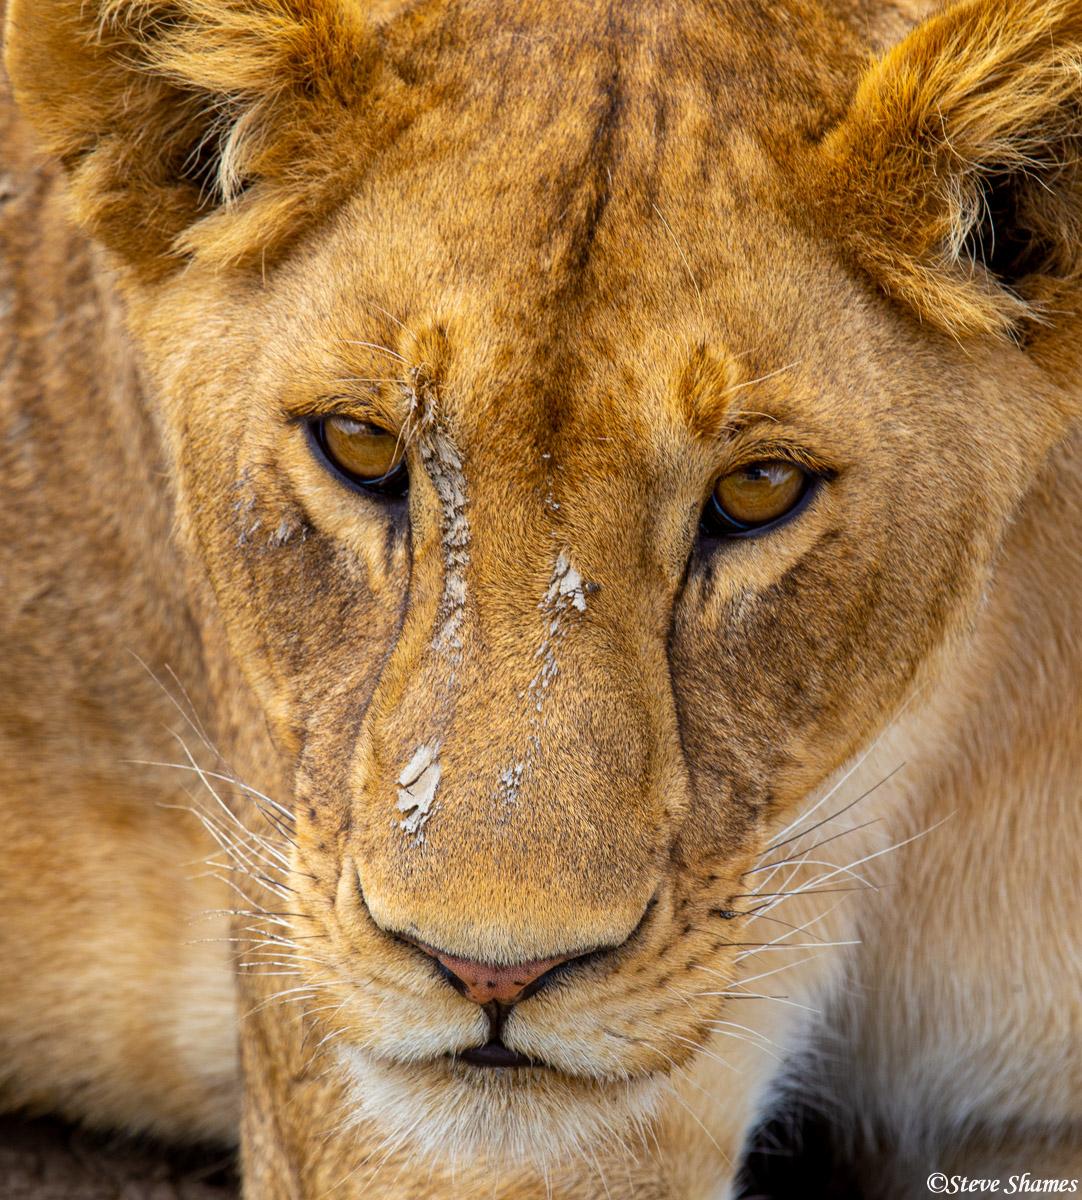 serengeti, national park, tanzania, muddy lioness, photo